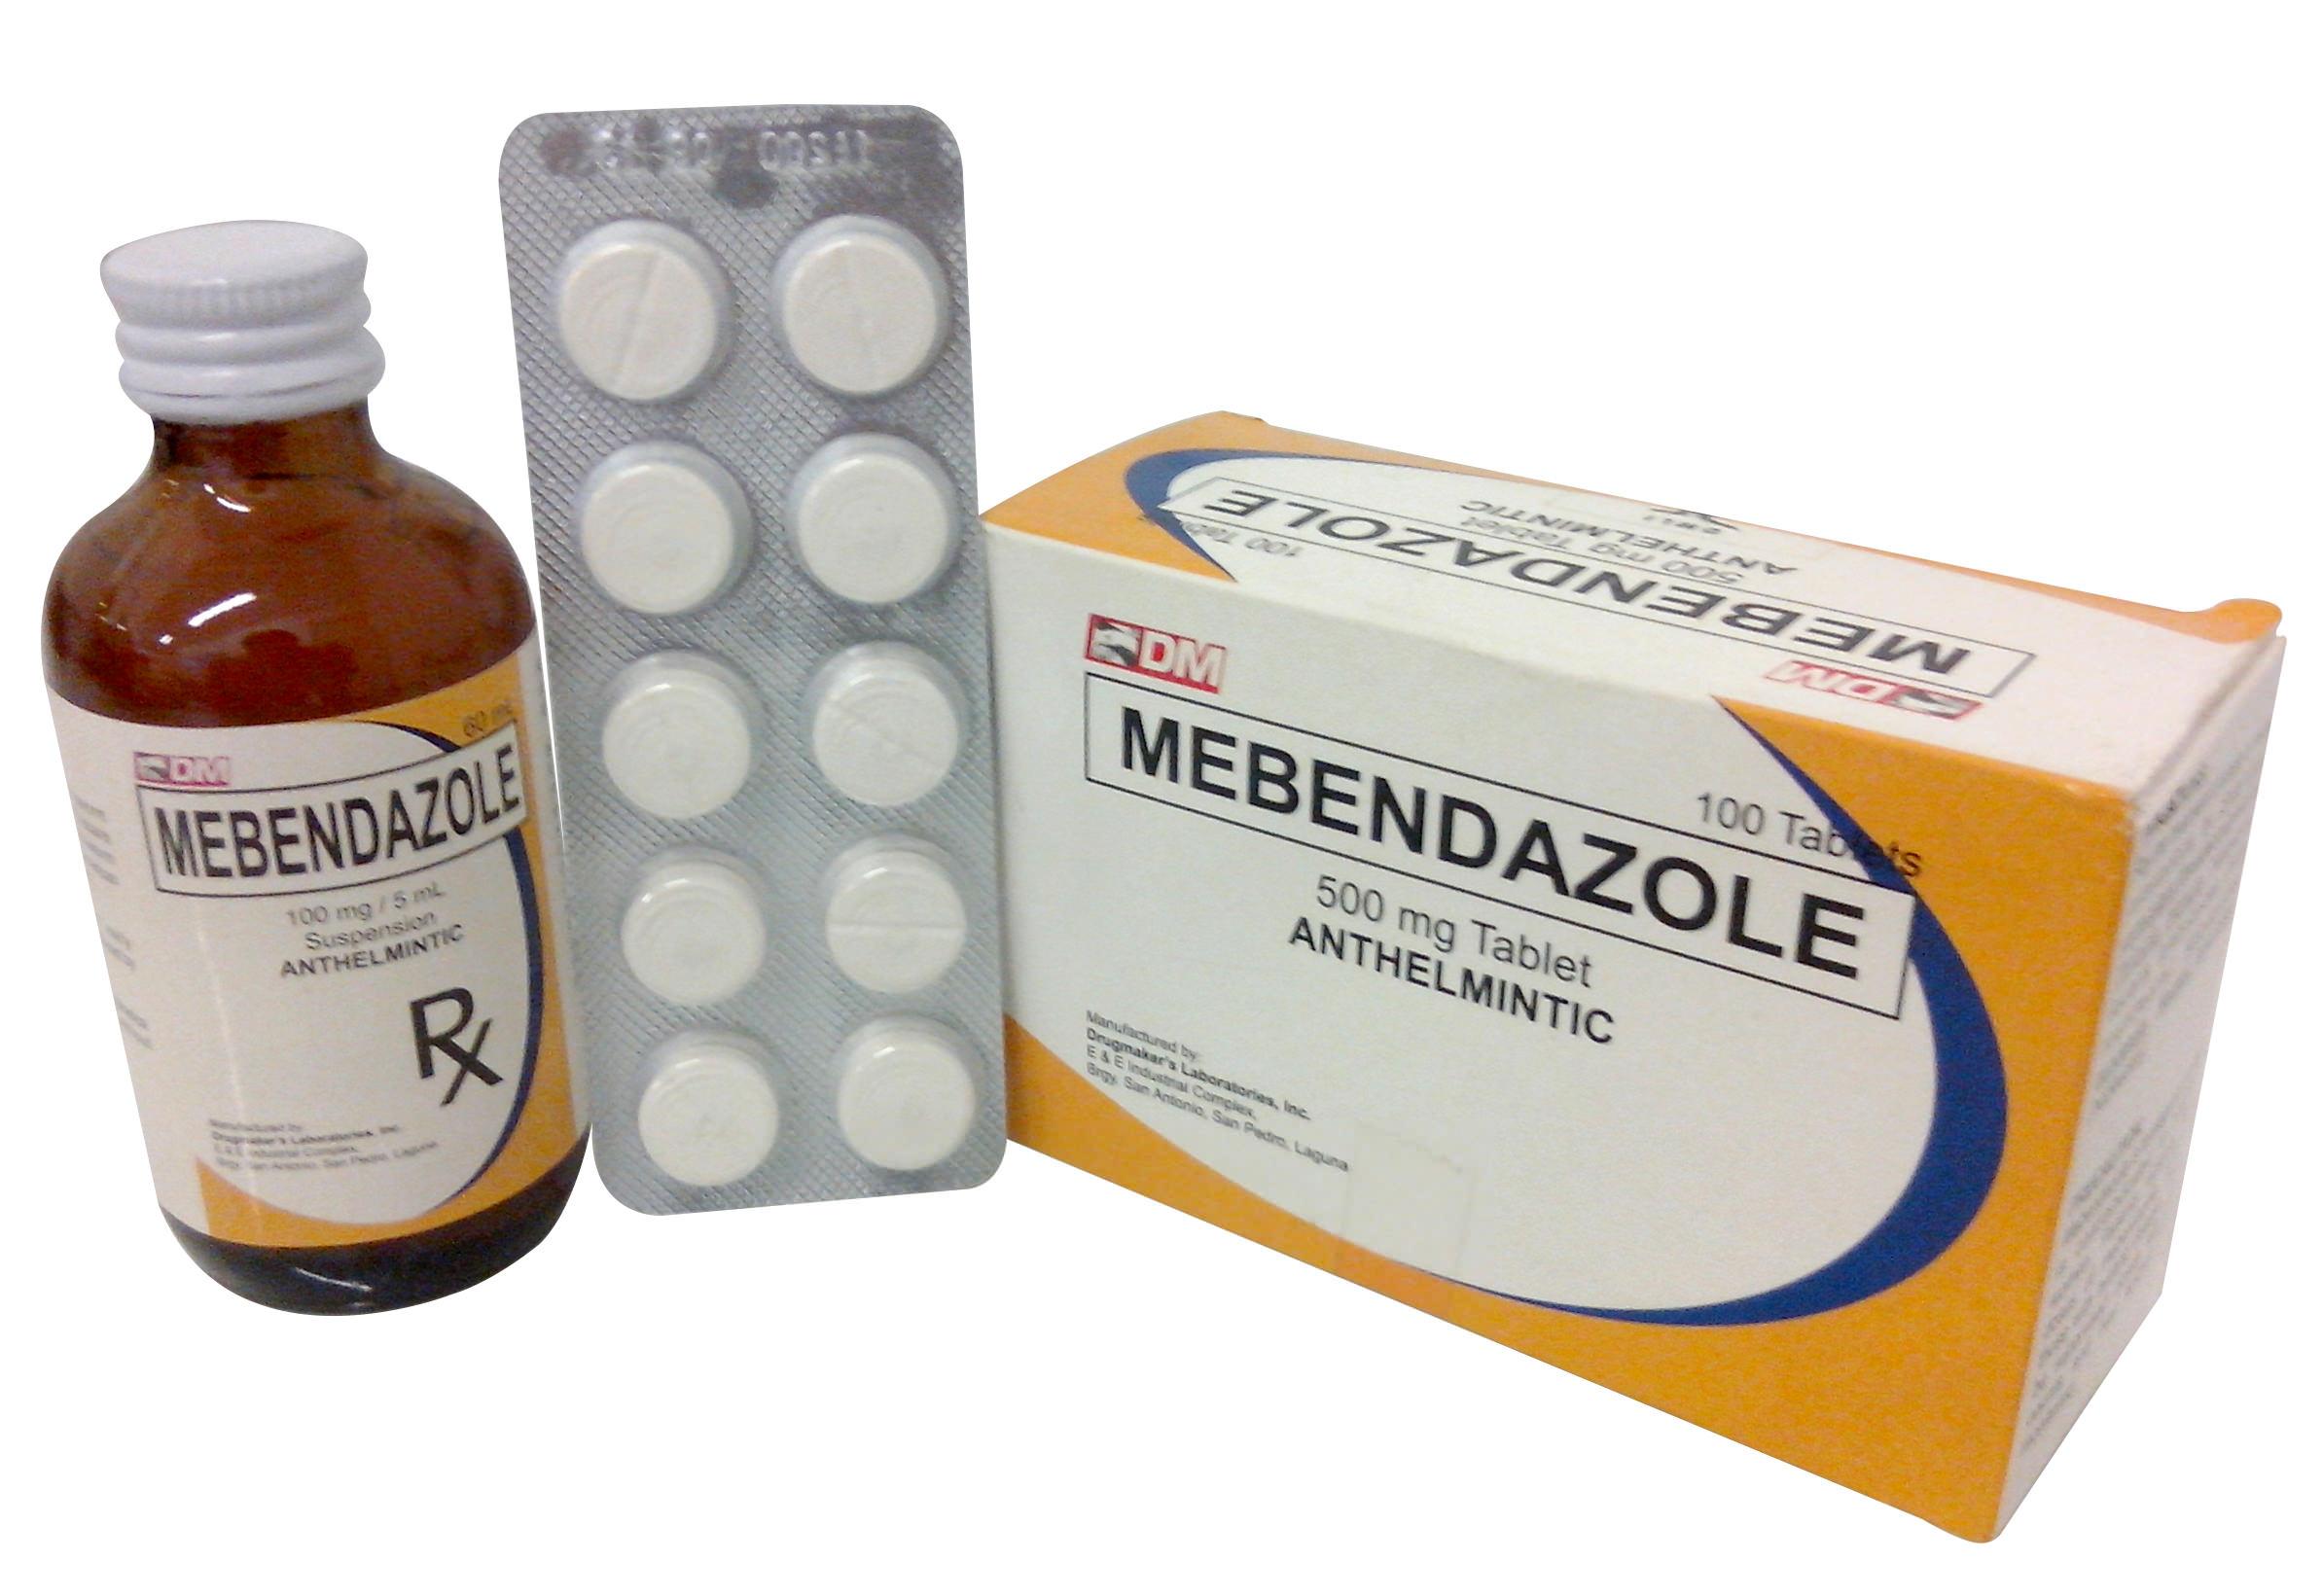 ميبندازول (أقـراص، معلـق) لعلاج الديدان mebendazole